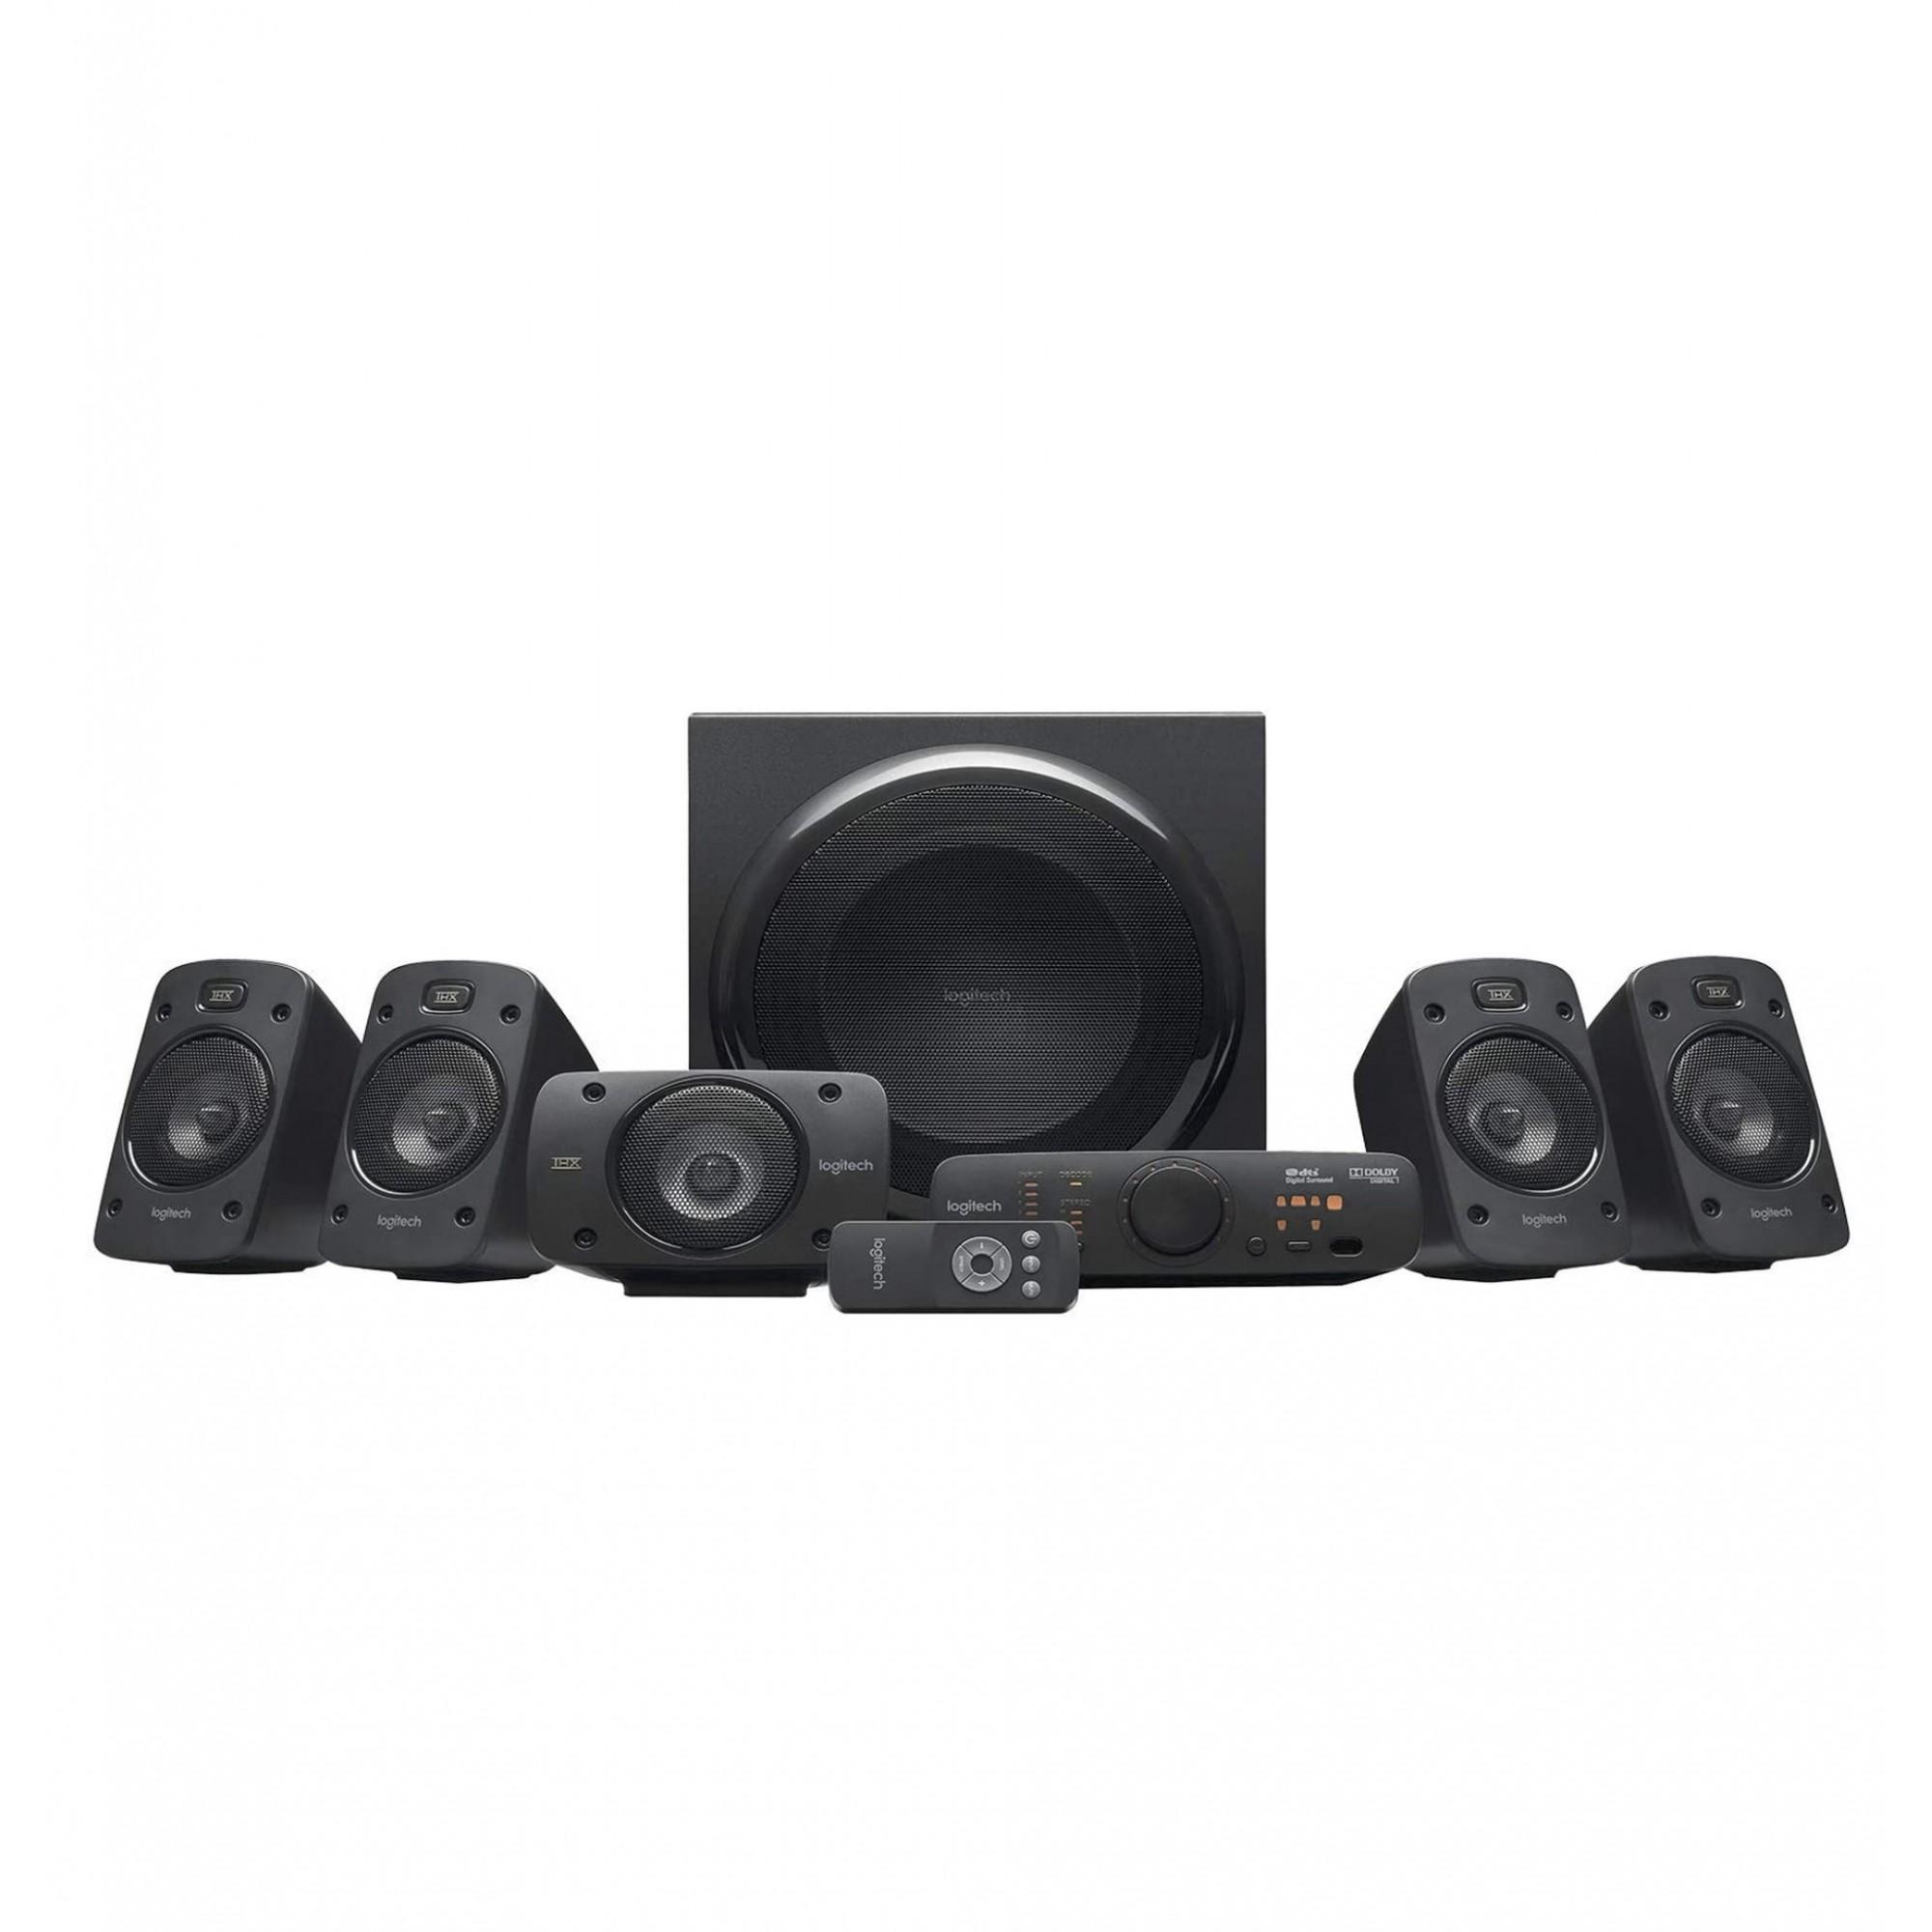 L o g i t e c h - Z906 5.1 Surround Thx, Dolby Digital E Dts 500w